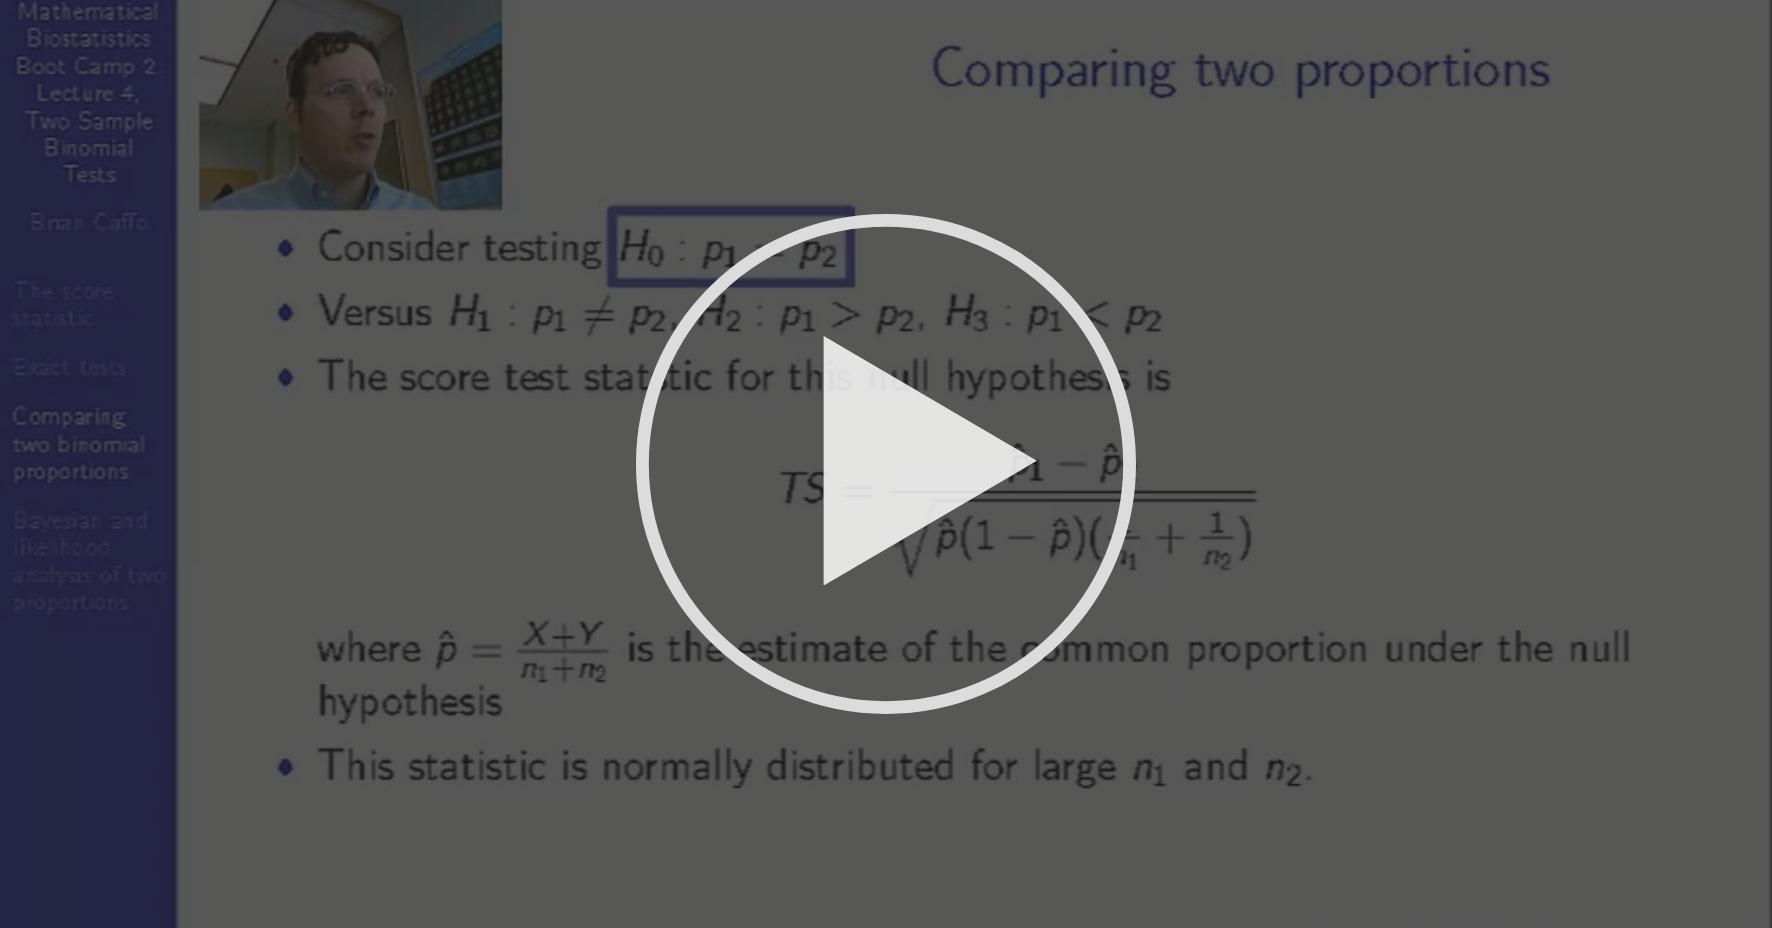 Two Sample Binomial Tests